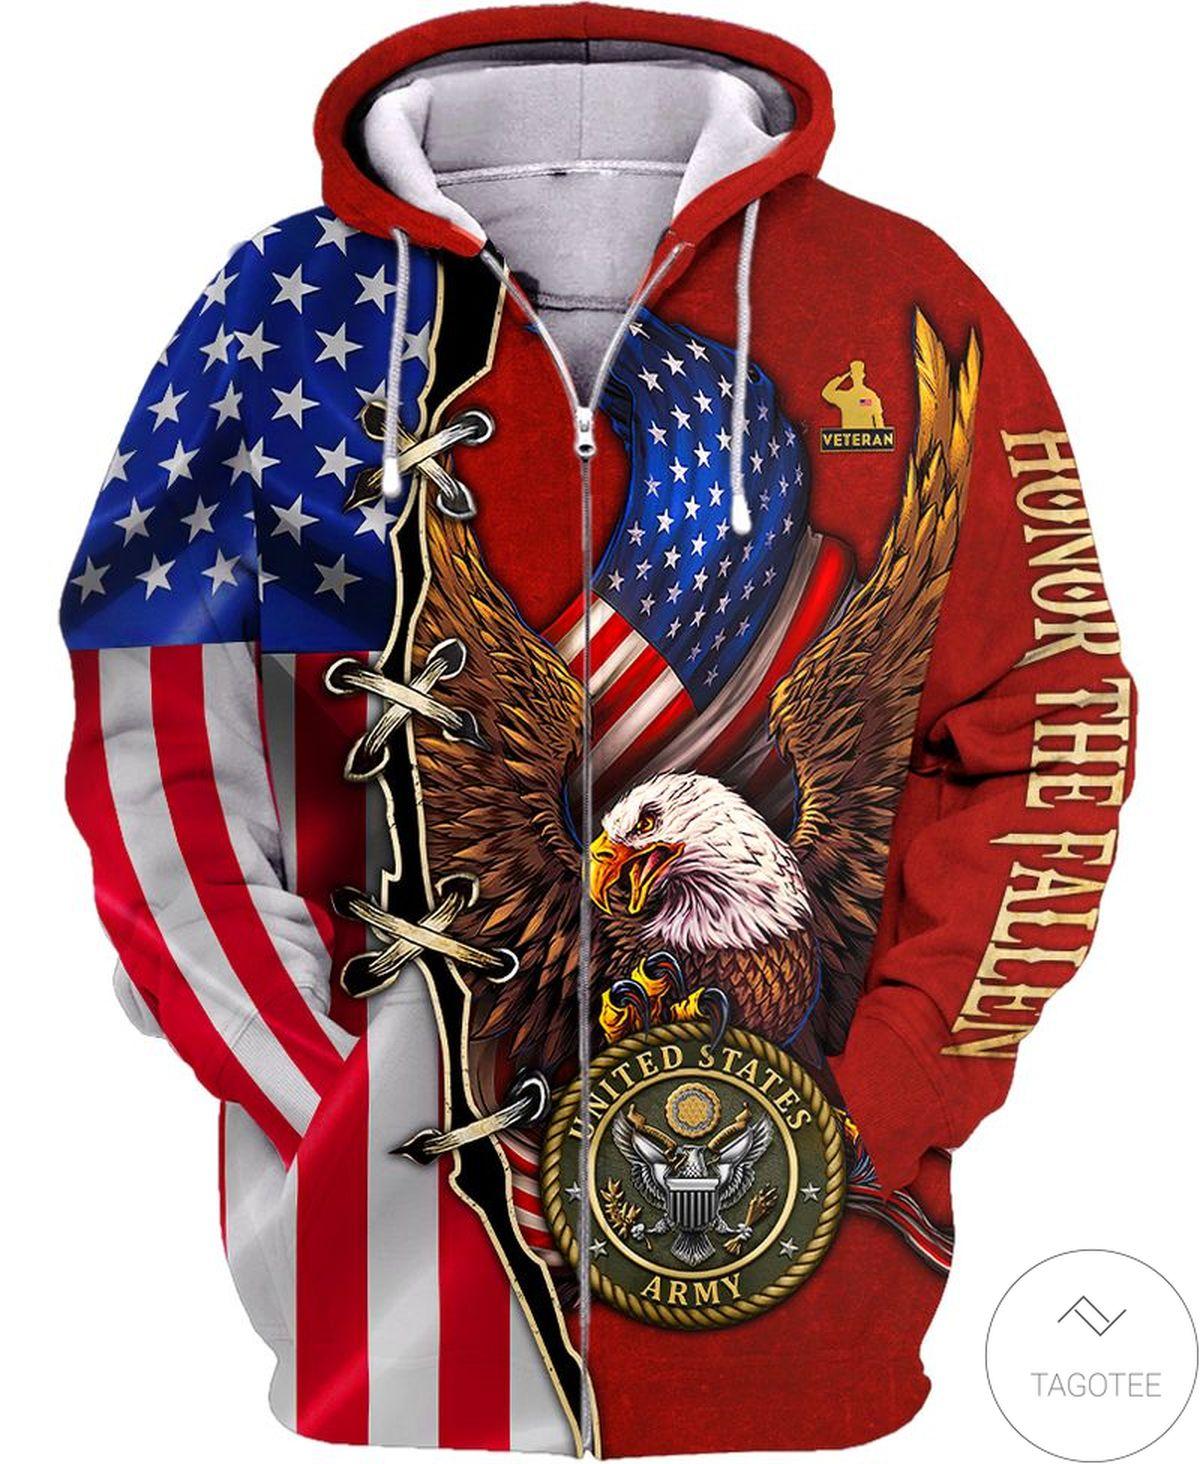 Us Army Horor The Faith Zip Hoodie